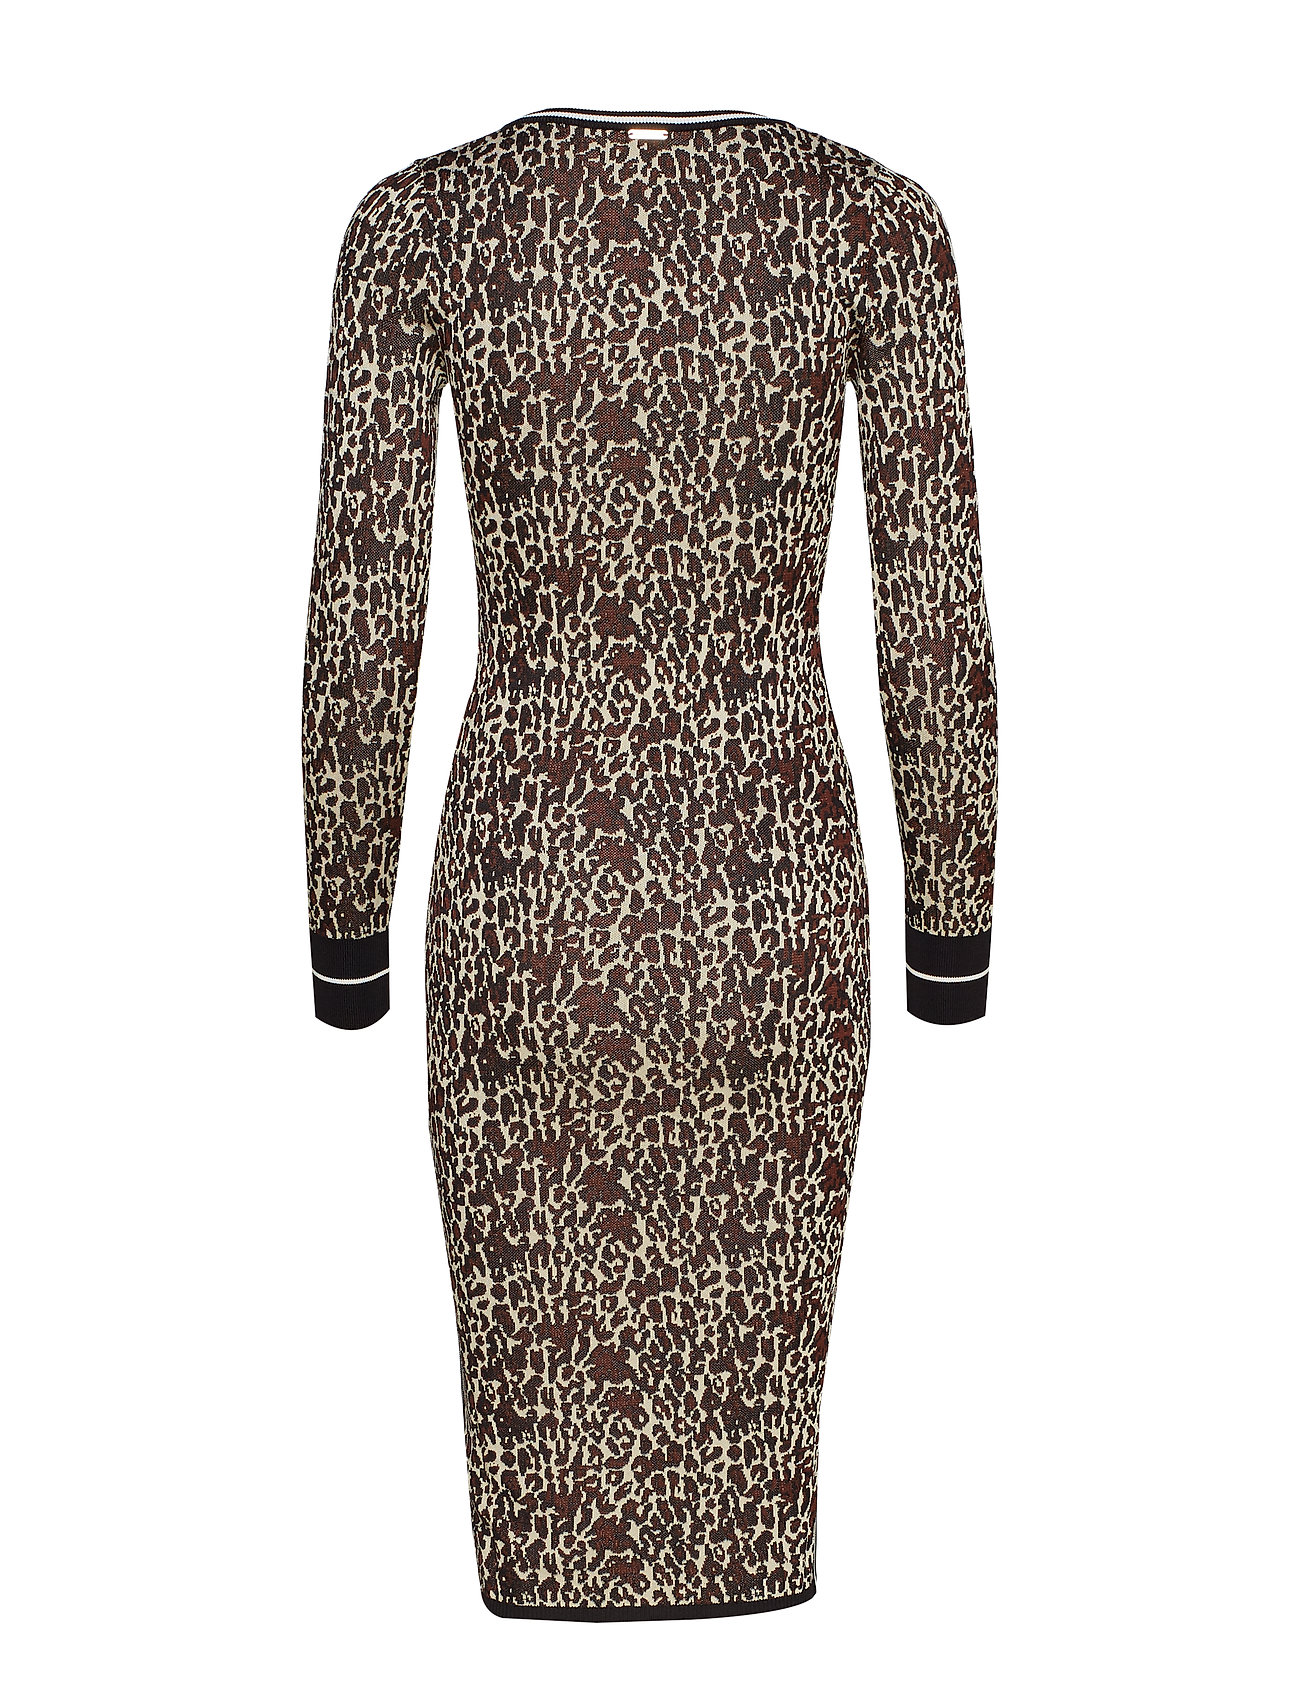 Leopard Ls Dressbeige Jeans Dafne ComGuess Sweater 3Rjq54LA